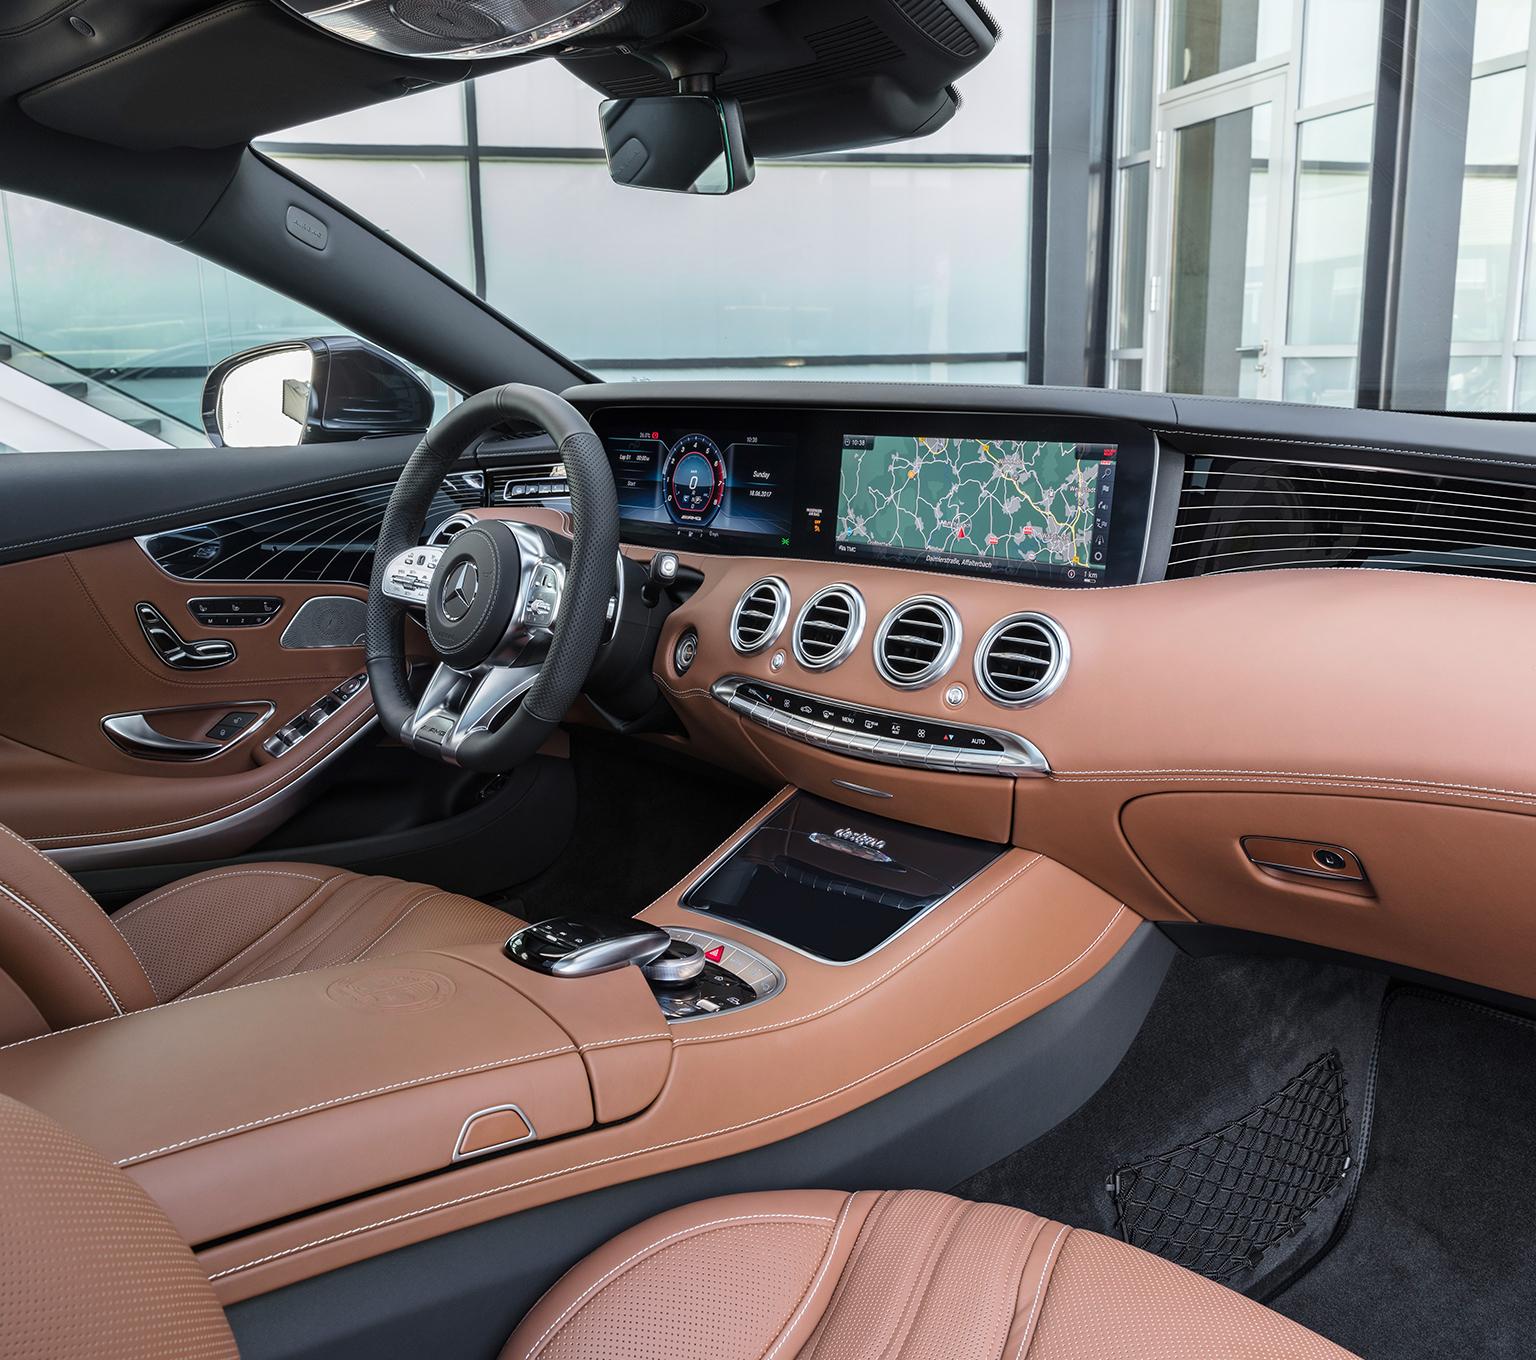 Mercedes Benz Home Of C E S Cls Cl Slk Sl R Glk M Gl G 2018 Class Coupe Future Highlights 02 D